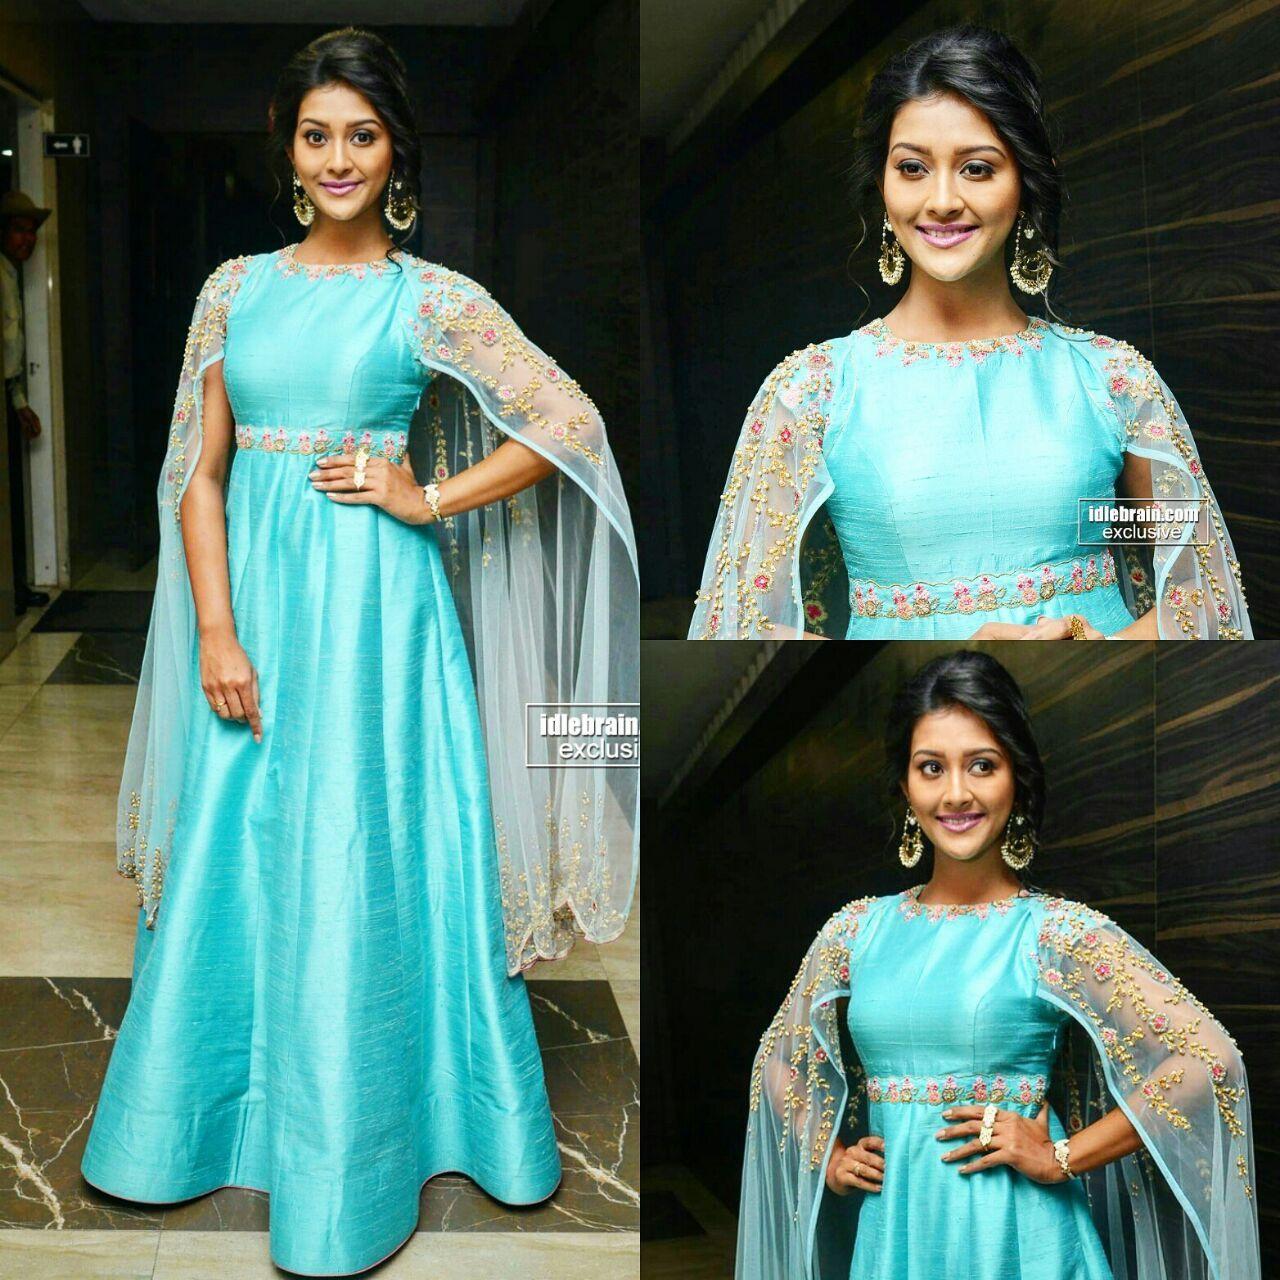 Pin by Spandana Reddy Sappidi on Dresses,sarees,lehangas   Pinterest ...